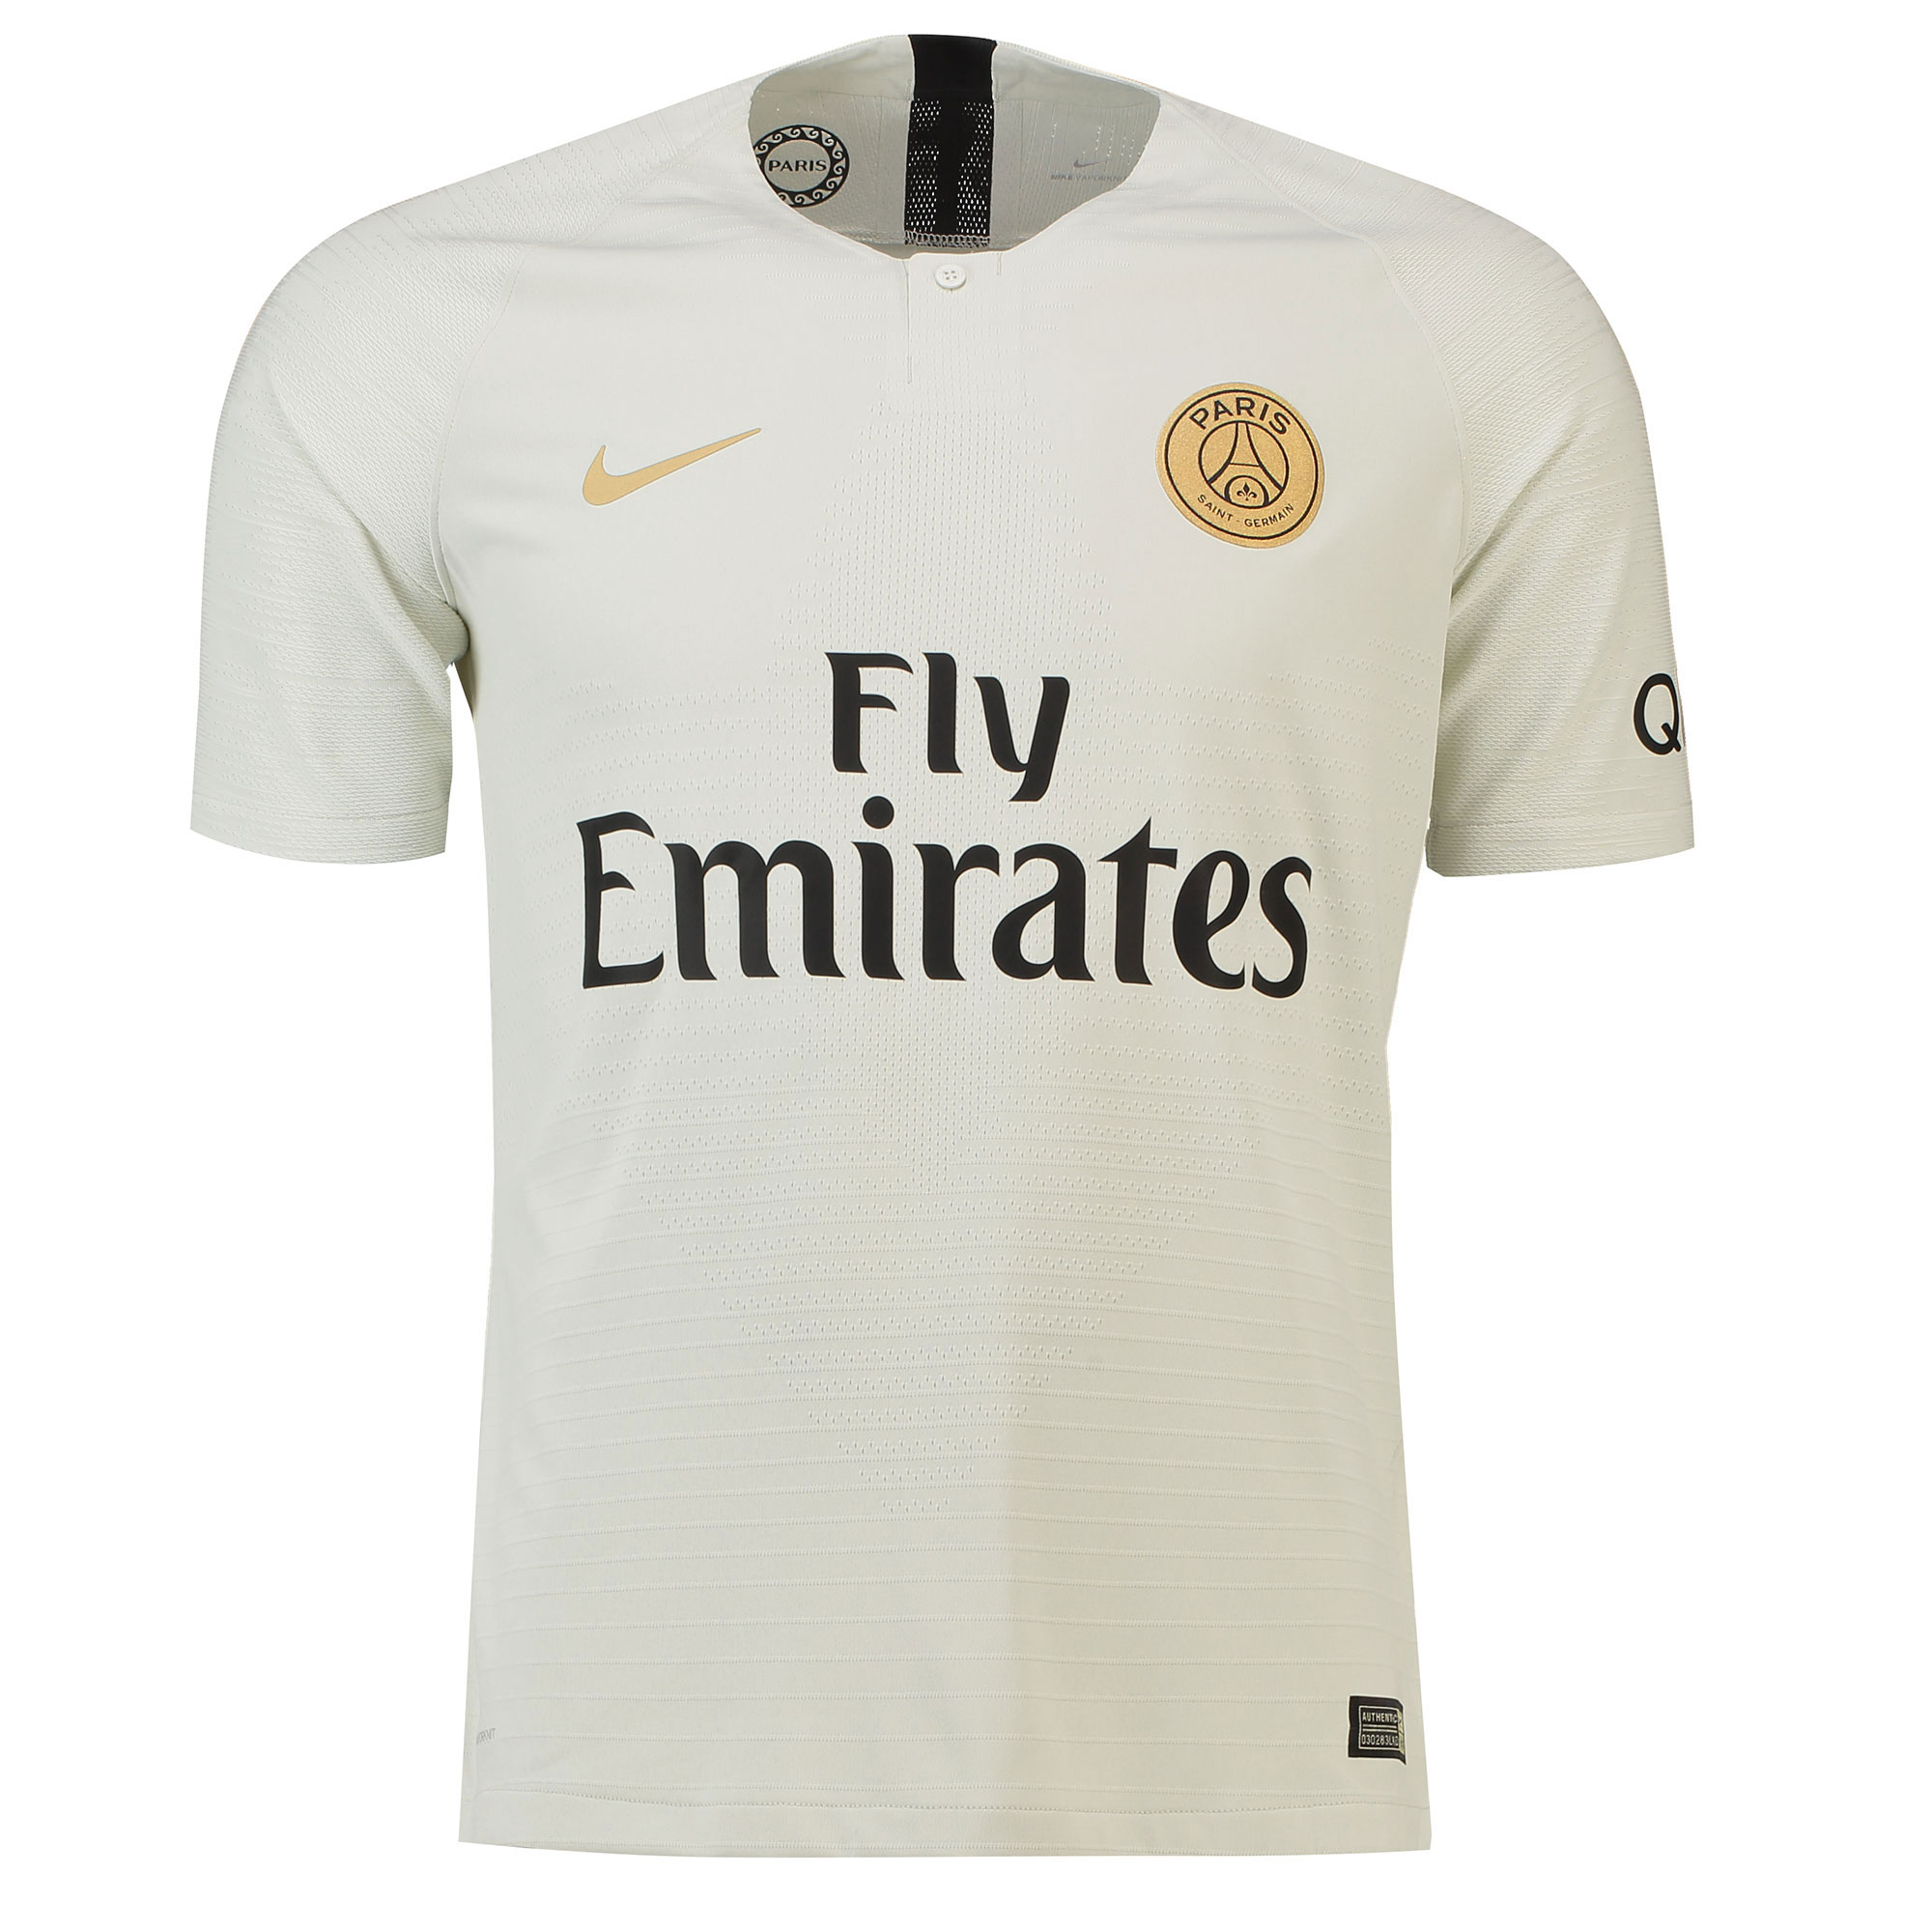 paris saint germain 18 19 nike away kit a paris saint-germain   18 19 nike away kit b 080362f54